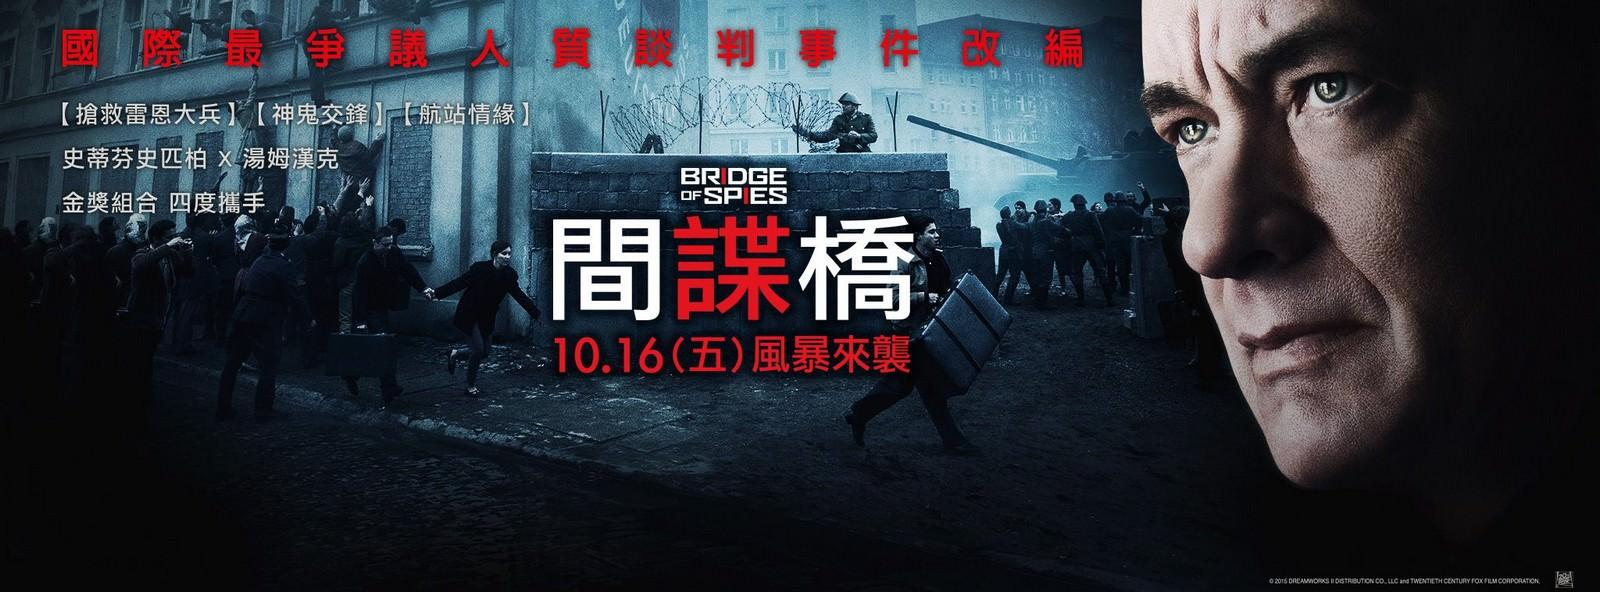 Movie, Bridge of Spies(美國, 2015年) / 間諜橋(台灣) / 间谍之桥(中國) / 換諜者(香港), 電影海報, 台灣, 橫版